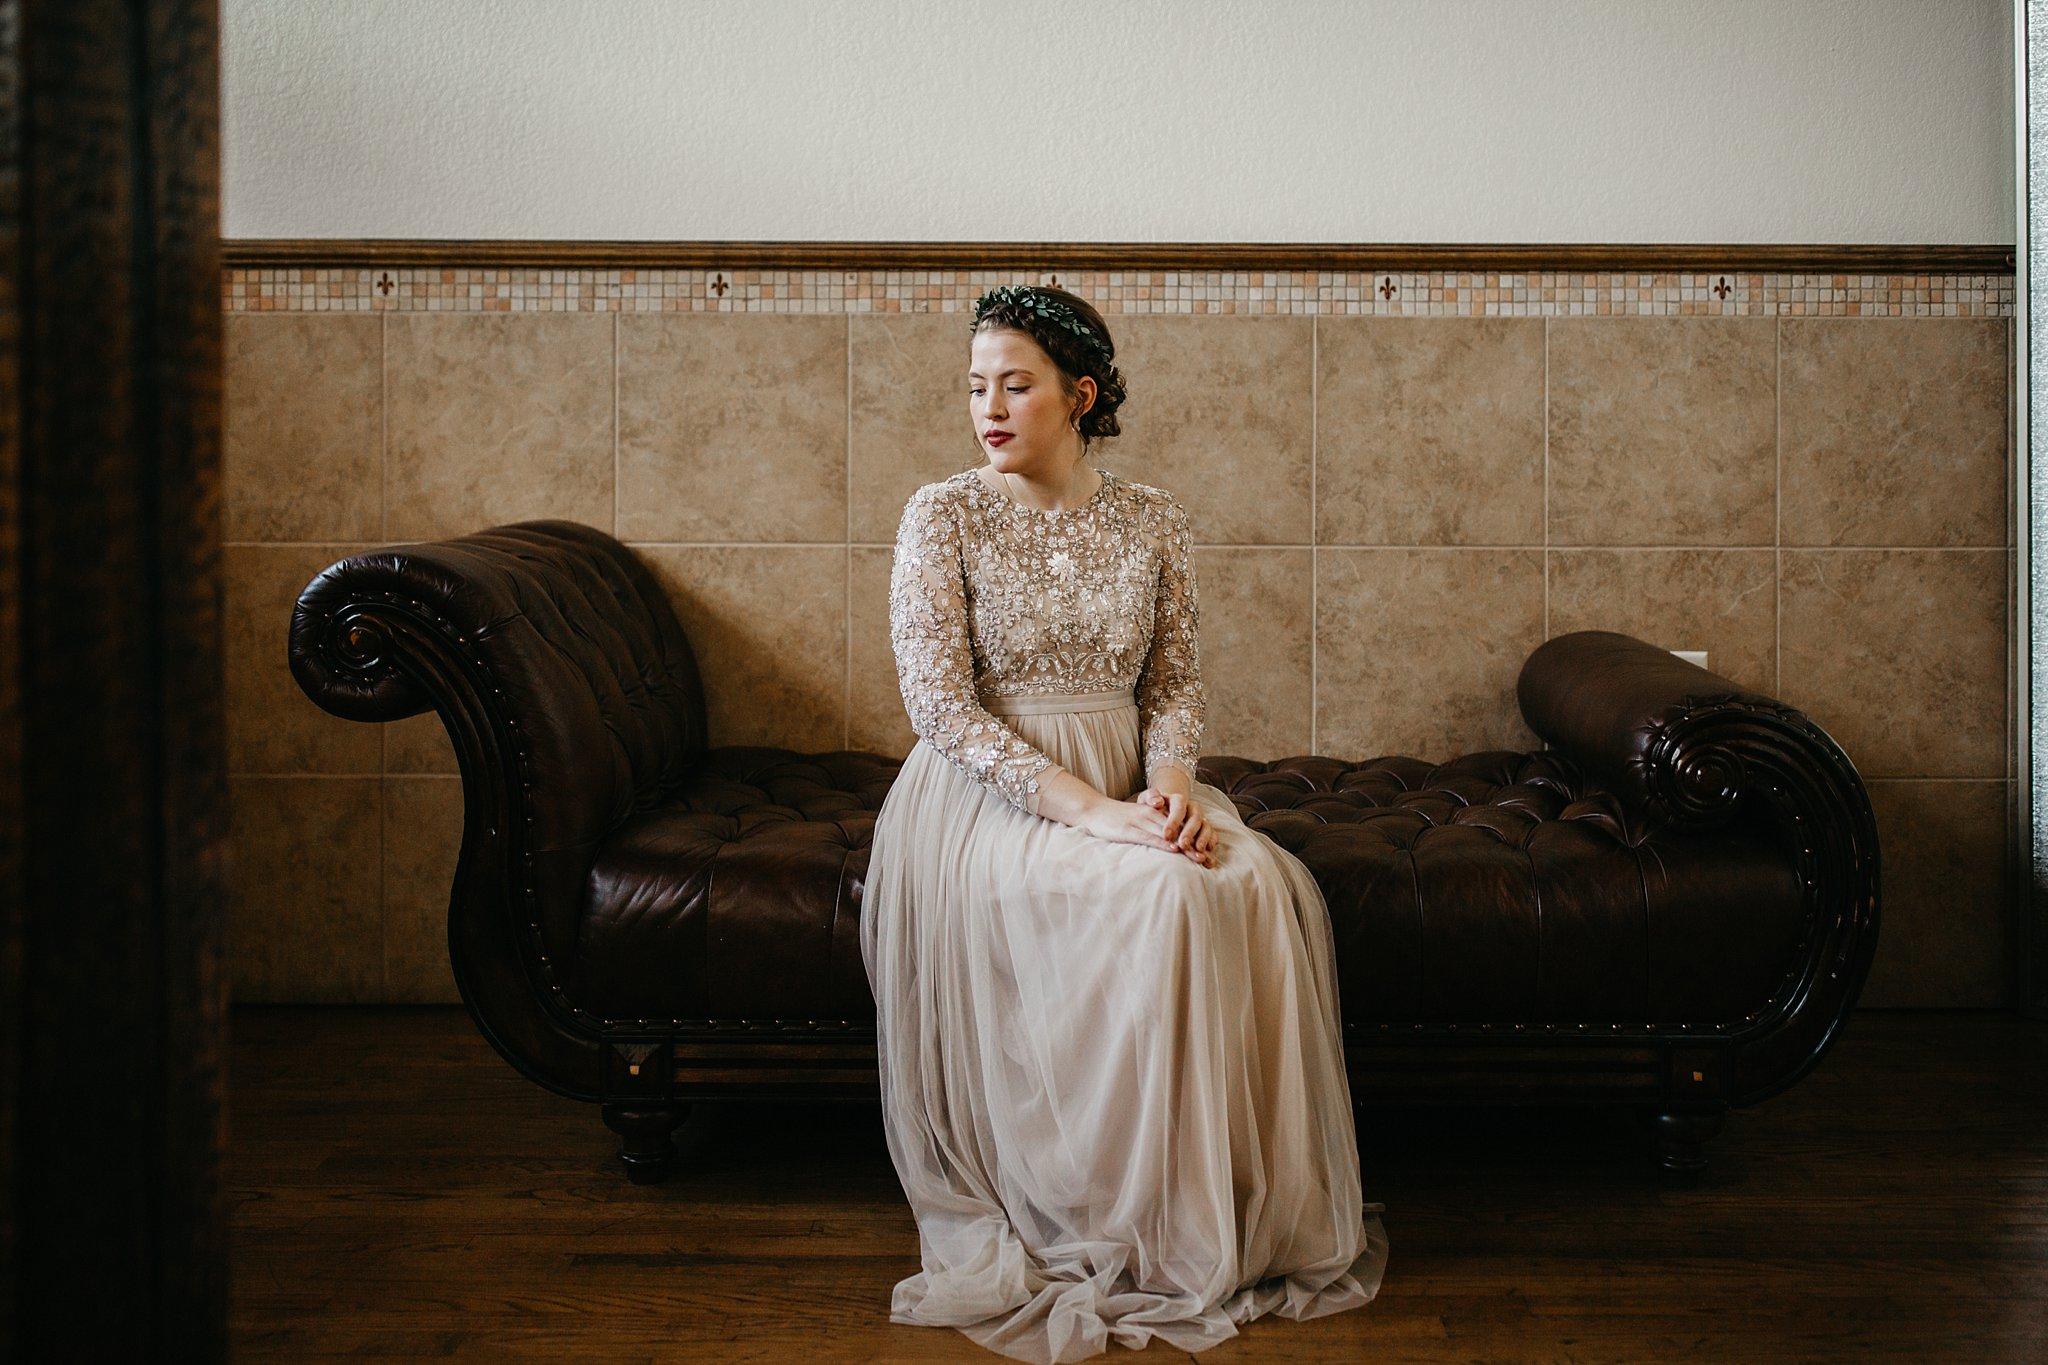 Wilderlove Co_Waco Texas_The Phoenix_Romantic Wedding Photography_0011.jpg